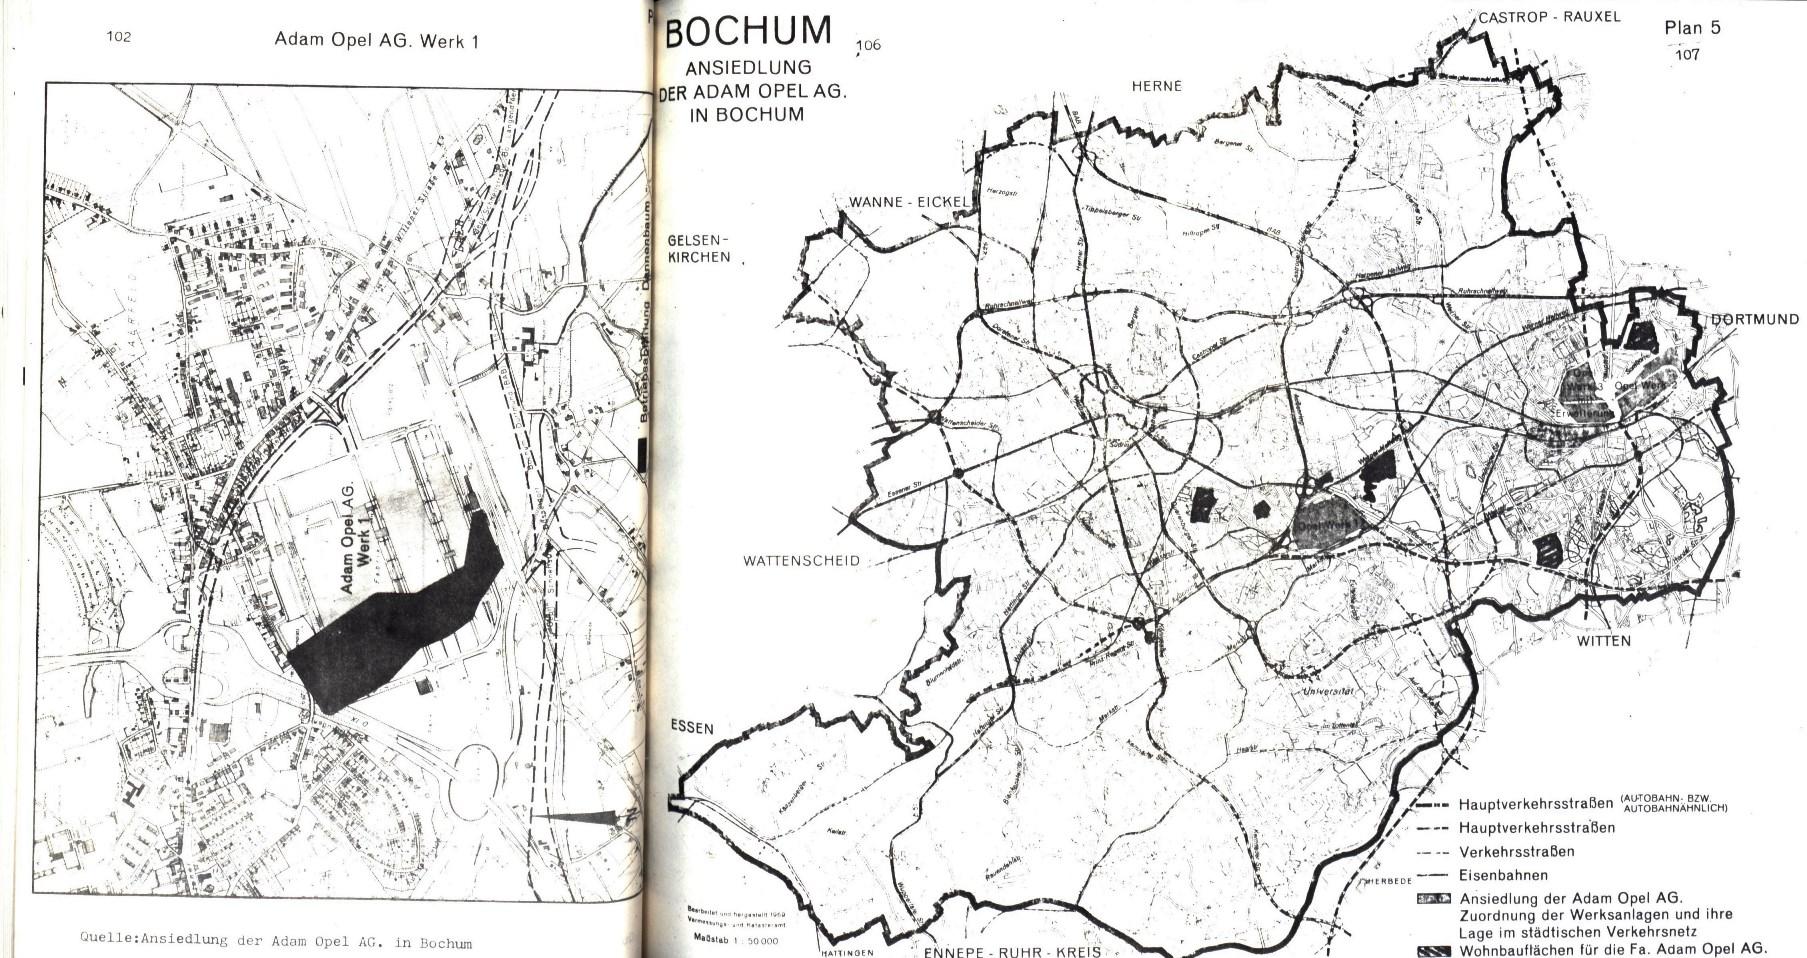 Bochum_IGM_Opel_PG_Opel_streikt_1973_054